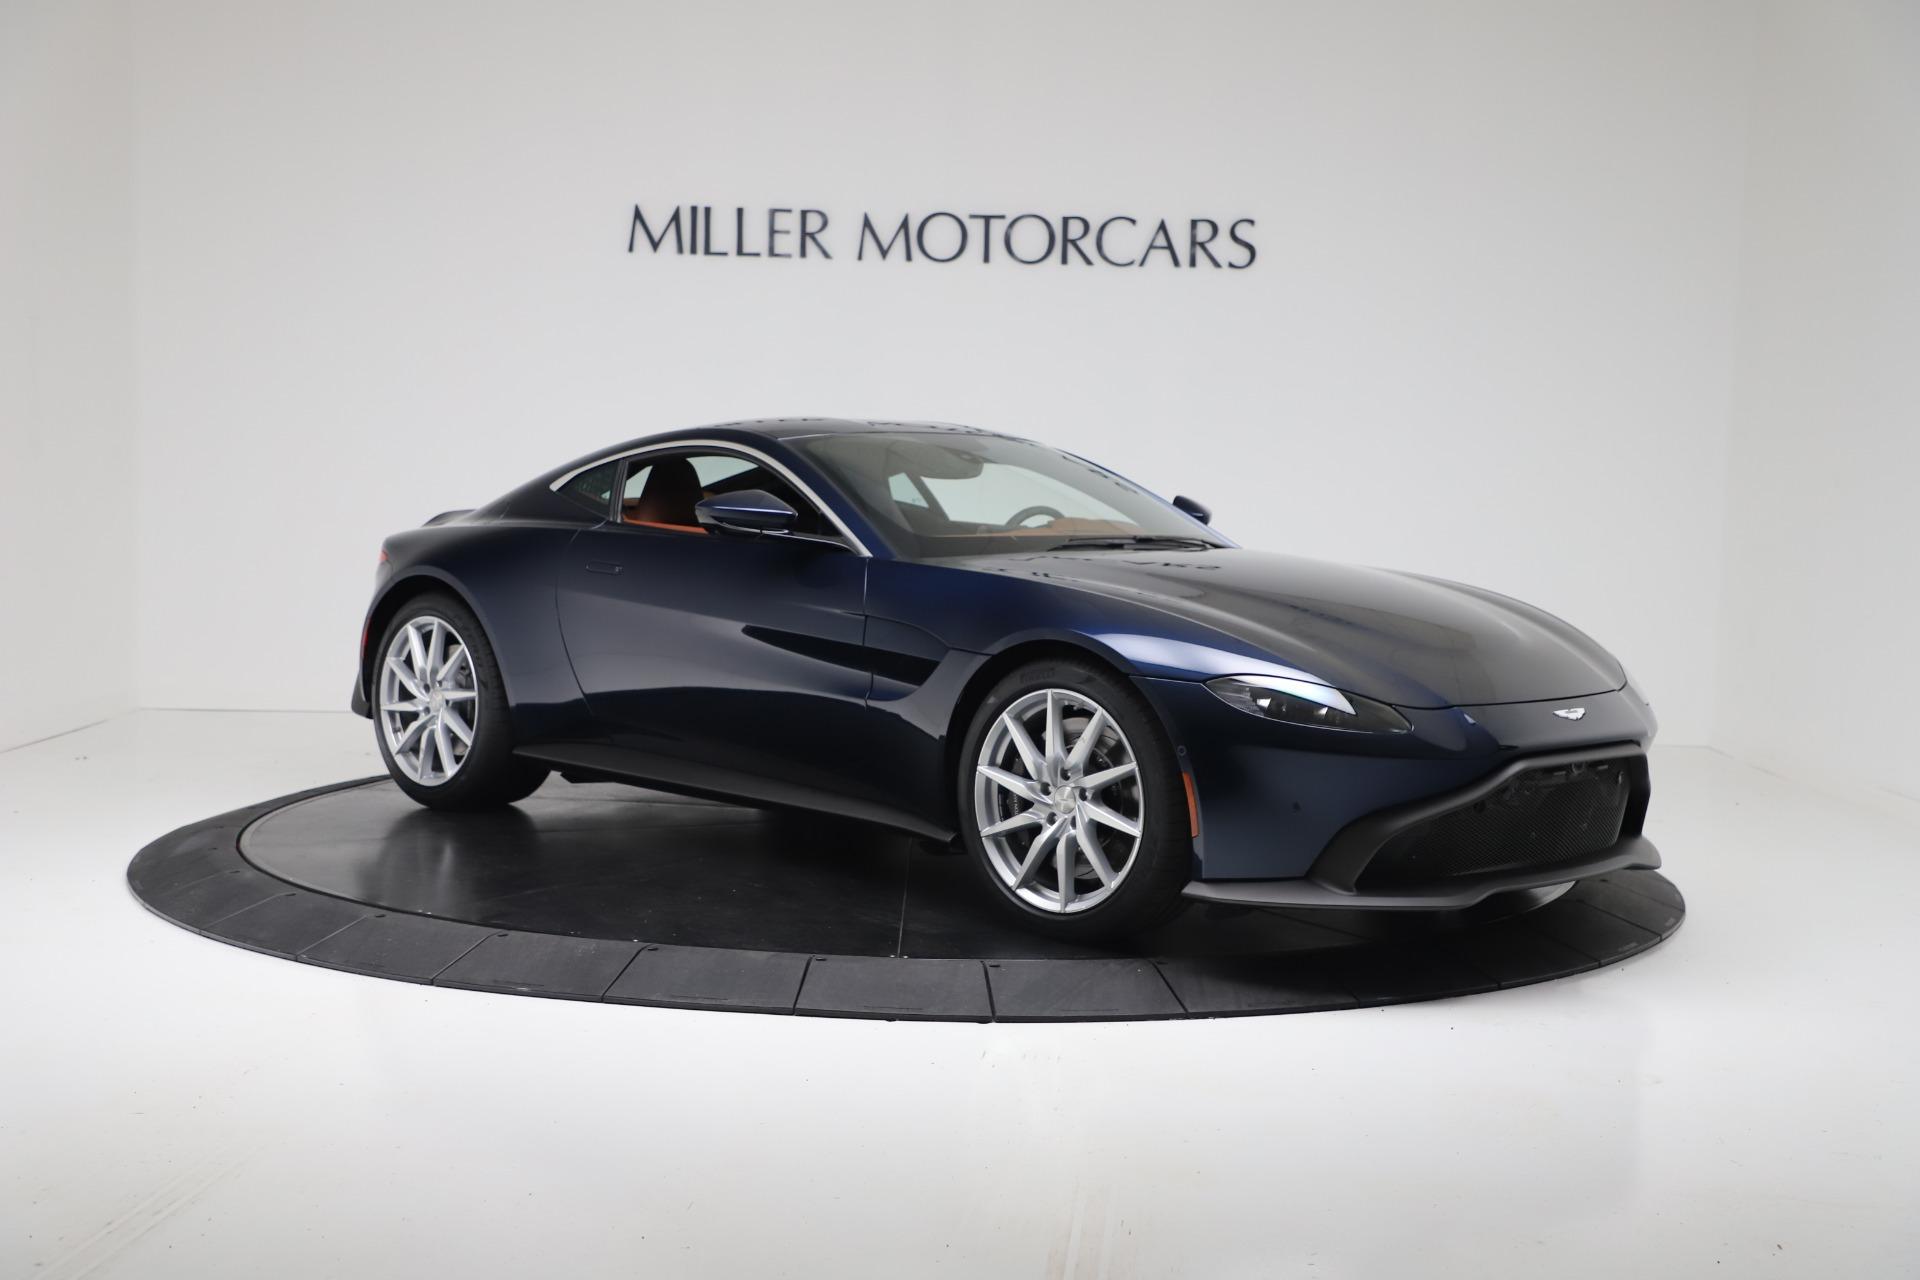 New 2020 Aston Martin Vantage V8 For Sale In Greenwich, CT 3378_p10